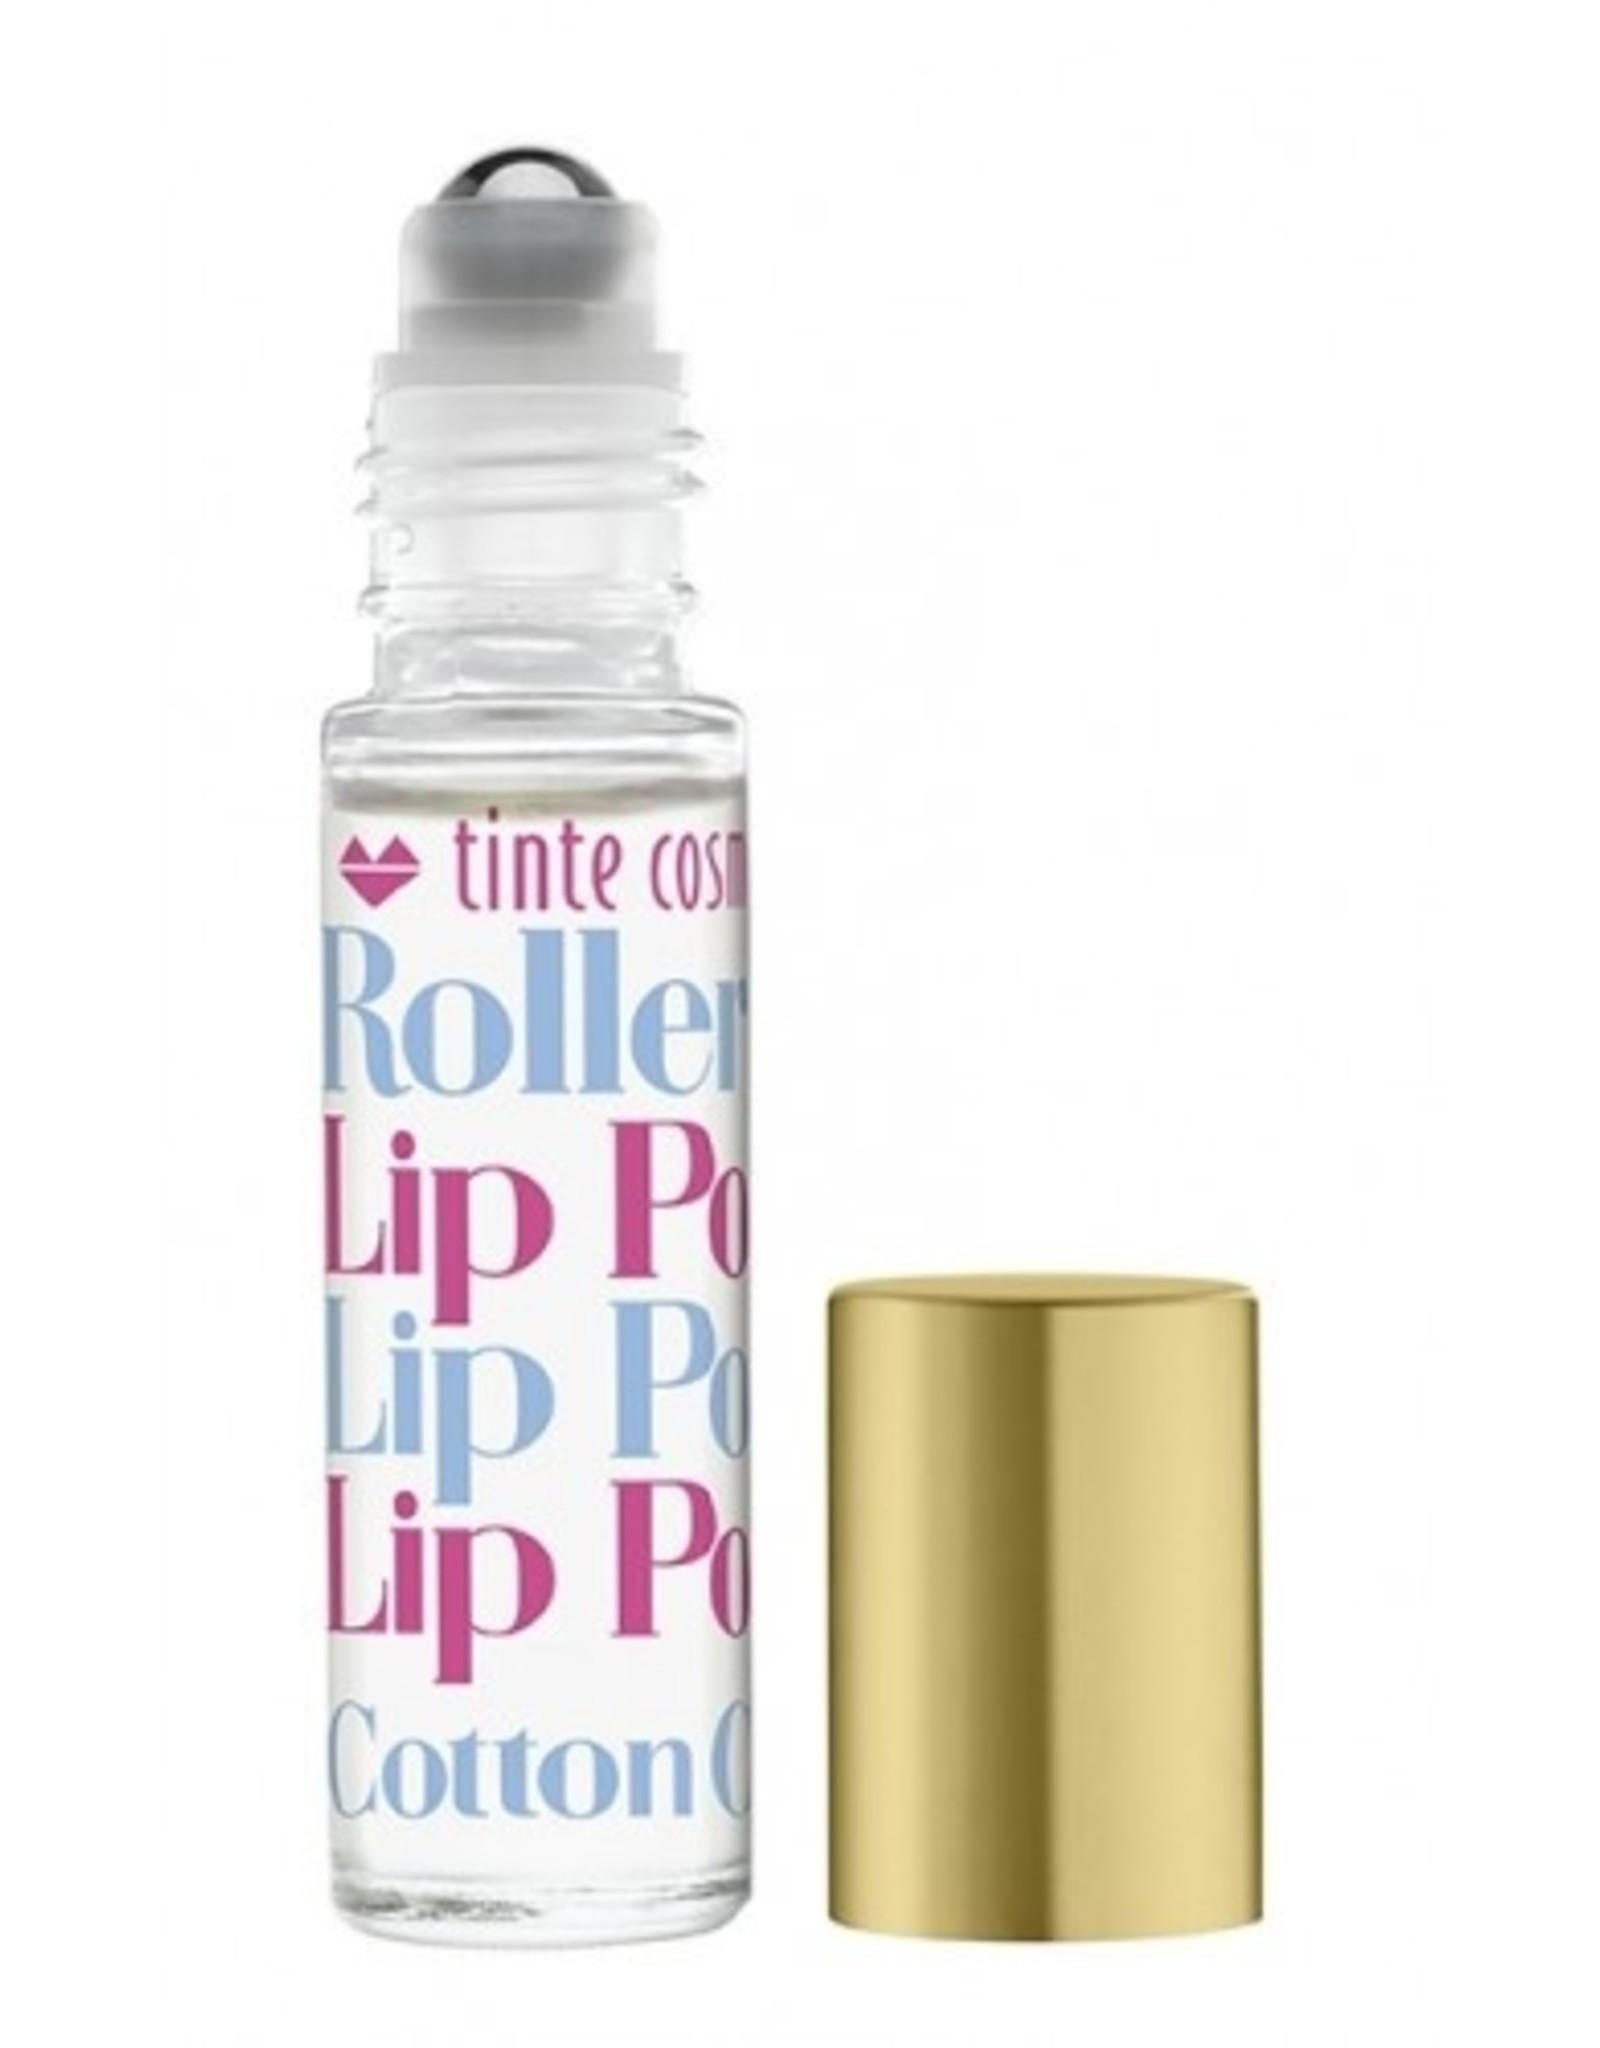 Tinte Cosmetics Tinte Cosmetics - Rollerball Lip Potions